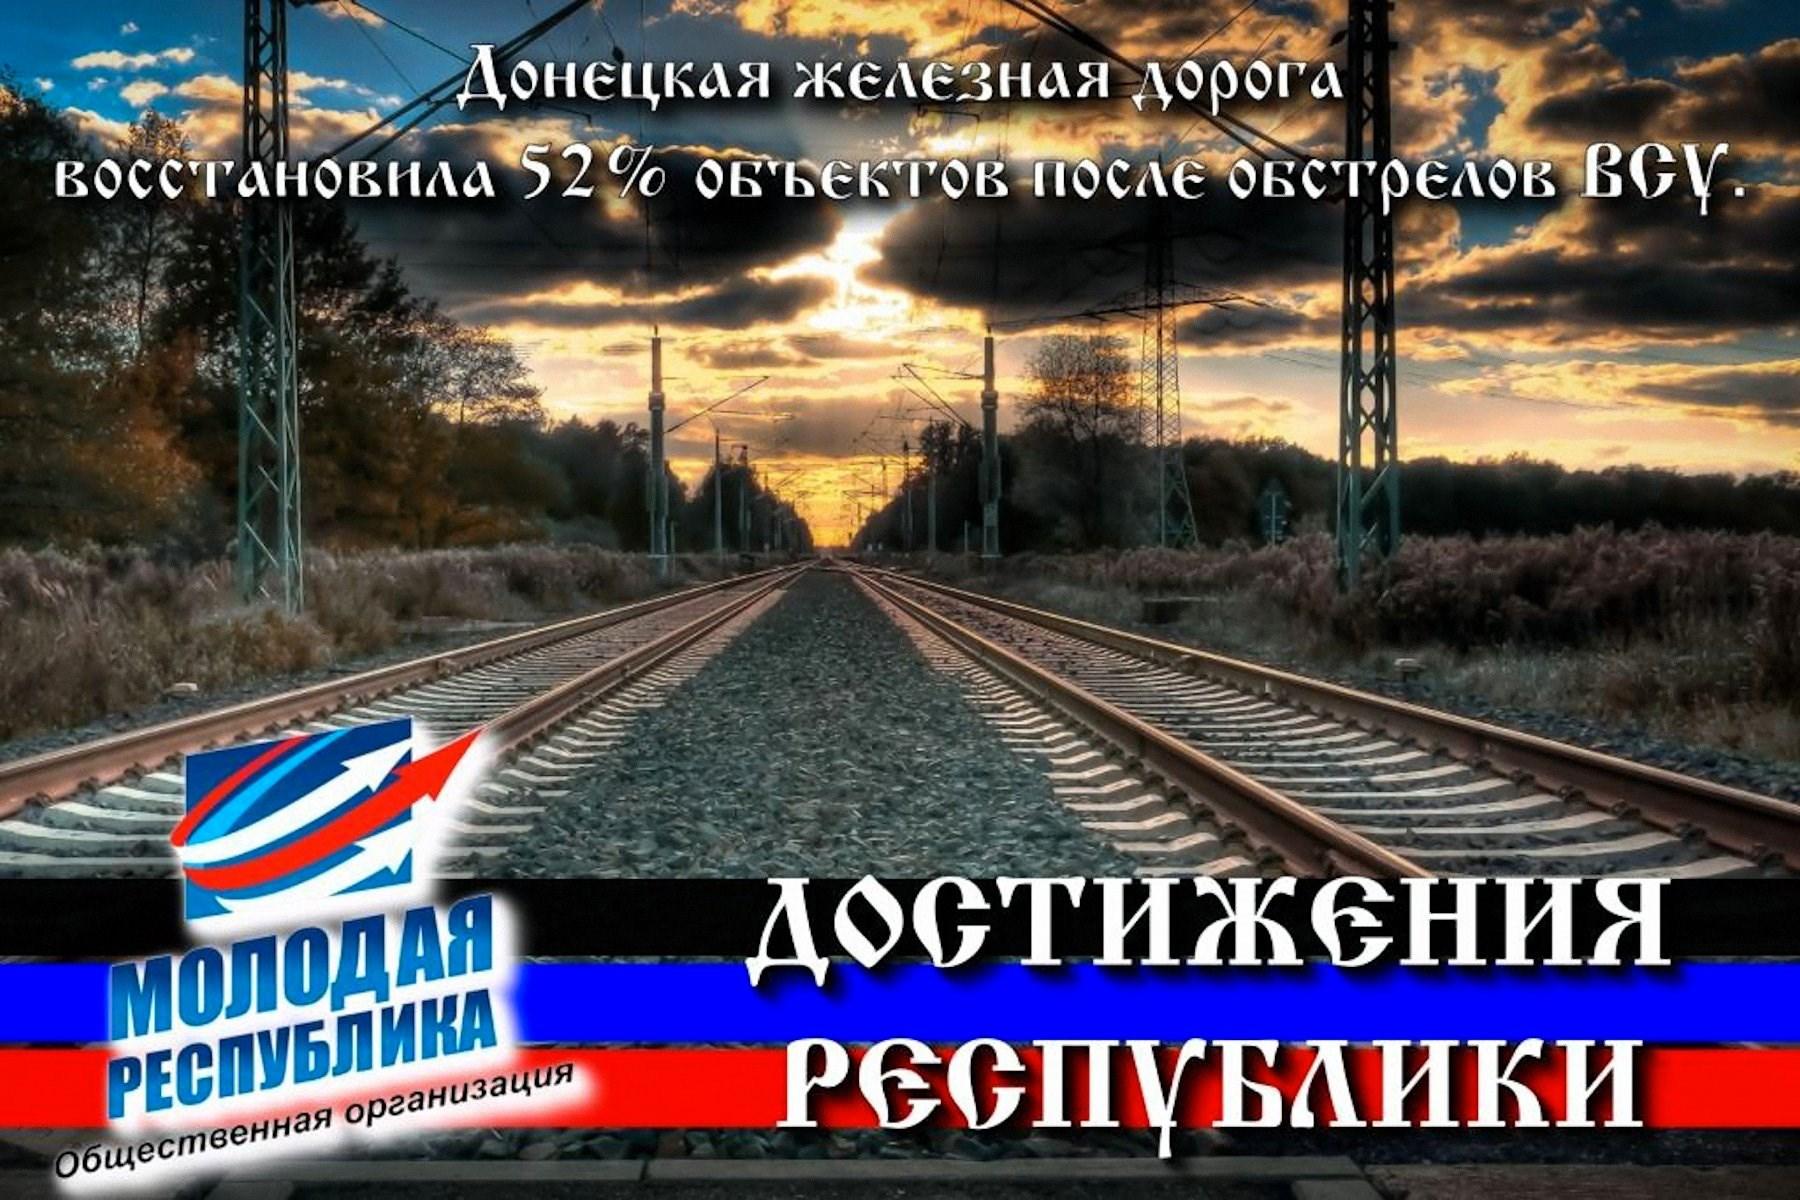 00 property of the republic dnr donetsk pr 04 280815